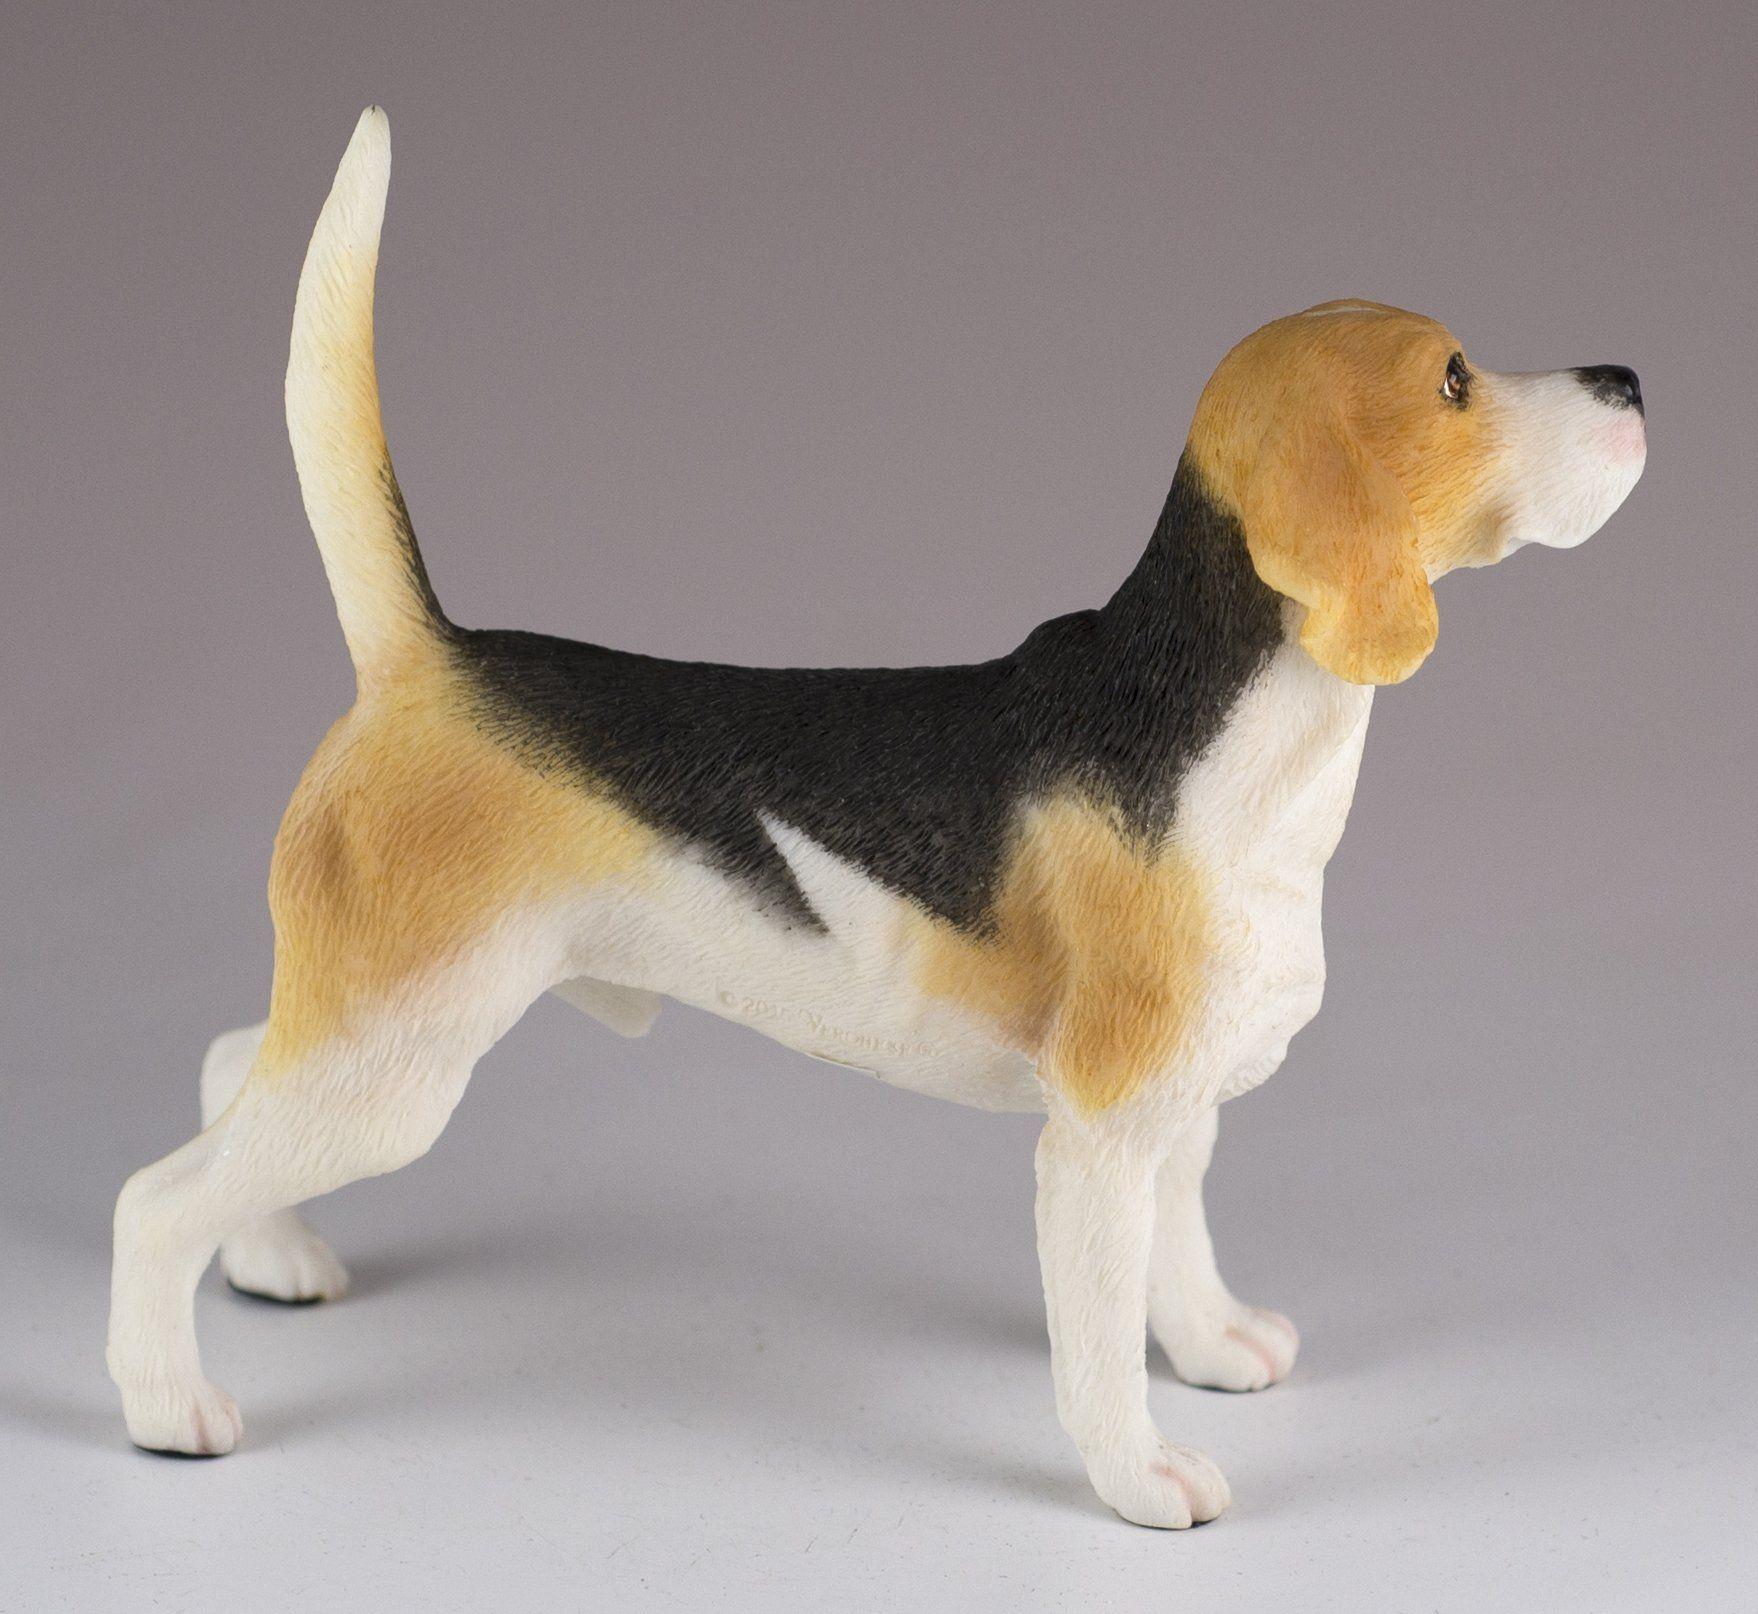 Beagle Hound Dog Figurine 3 75 Beagle Hound Hound Dog Beagle